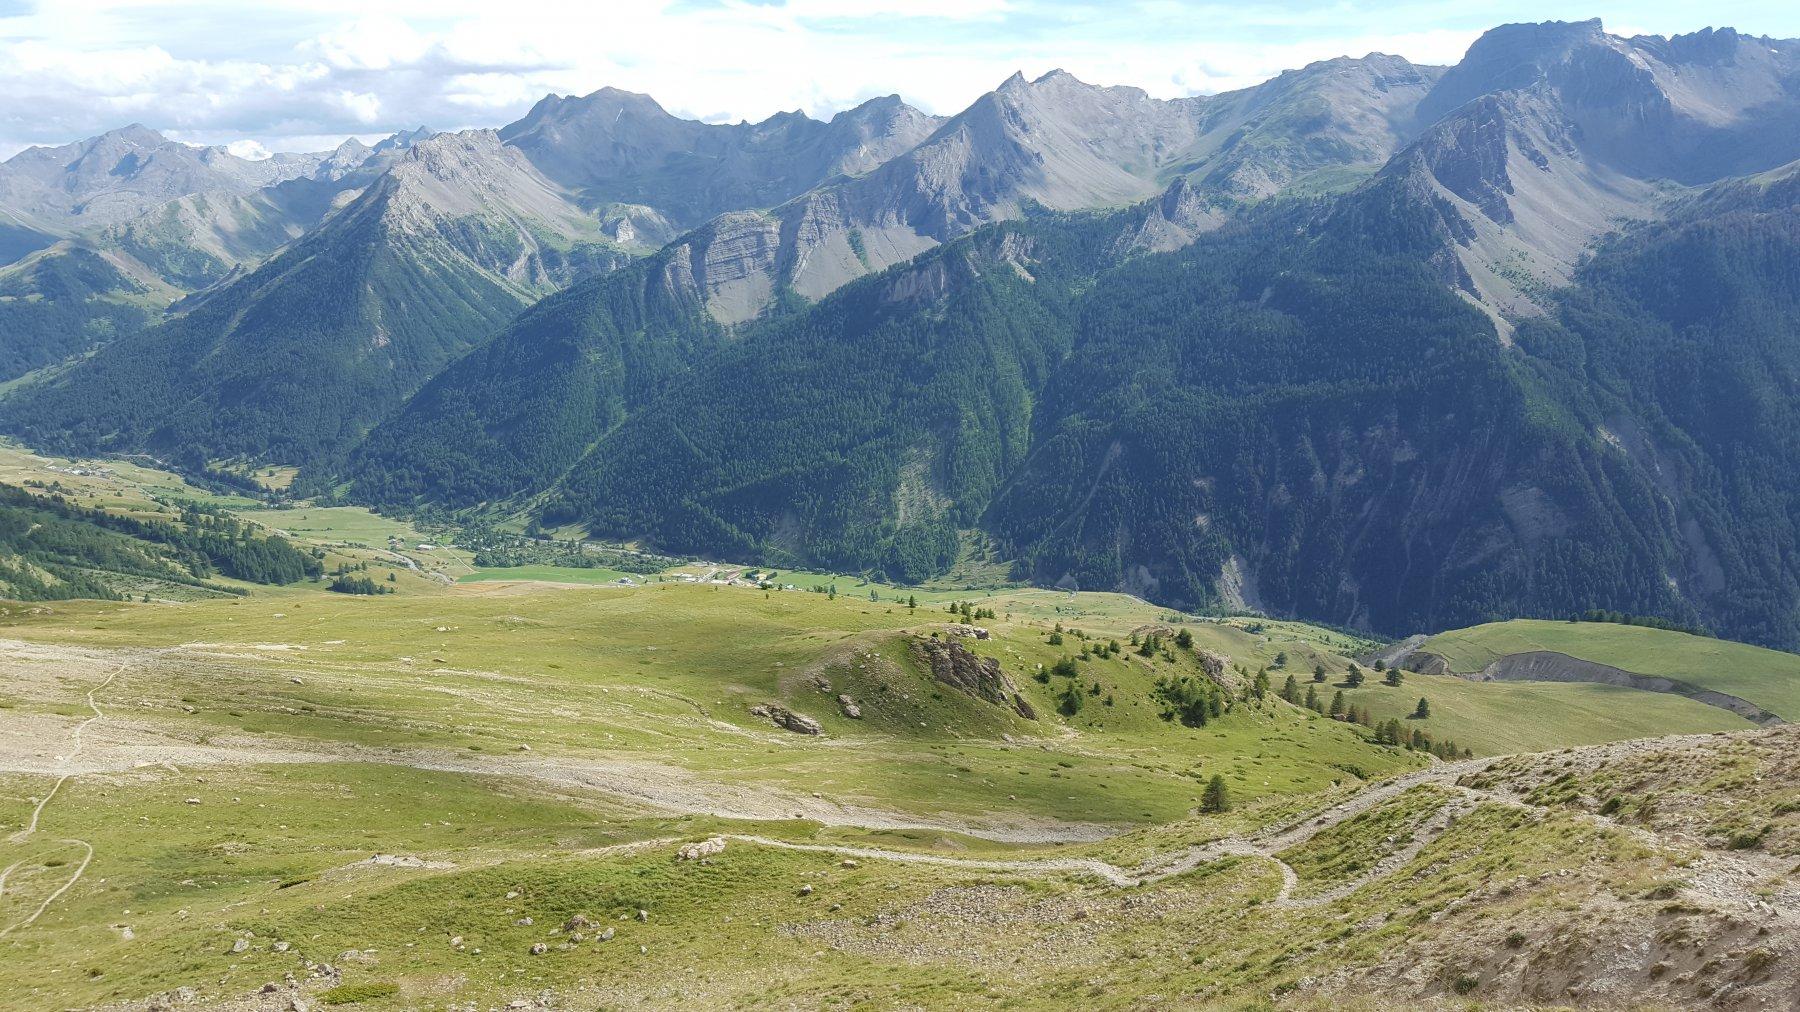 La discesa dal Col de Mallemort